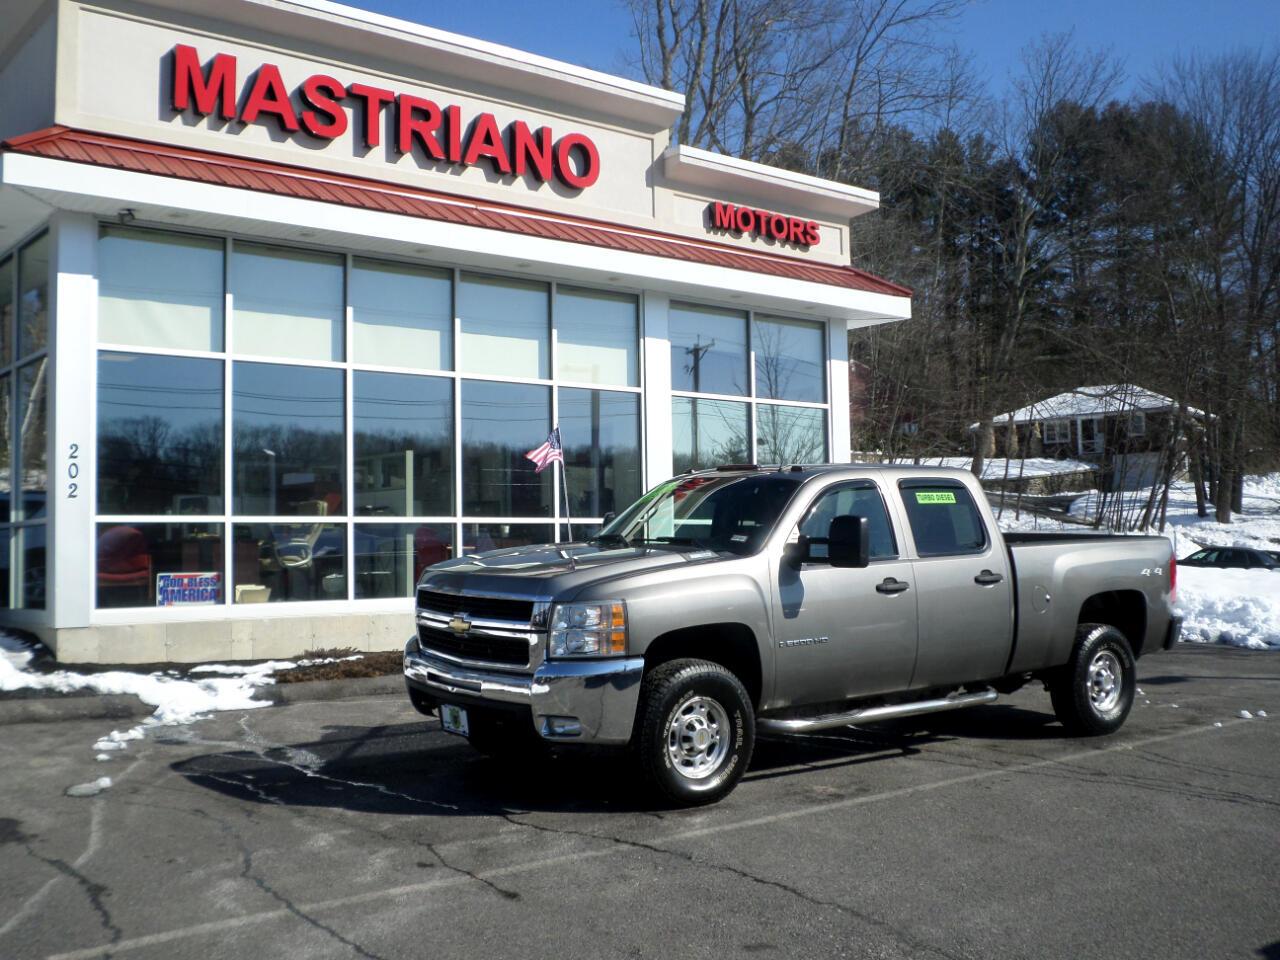 2008 Chevrolet Silverado 2500HD CREW CAB DURAMAX DIESEL ALLISON TRANS